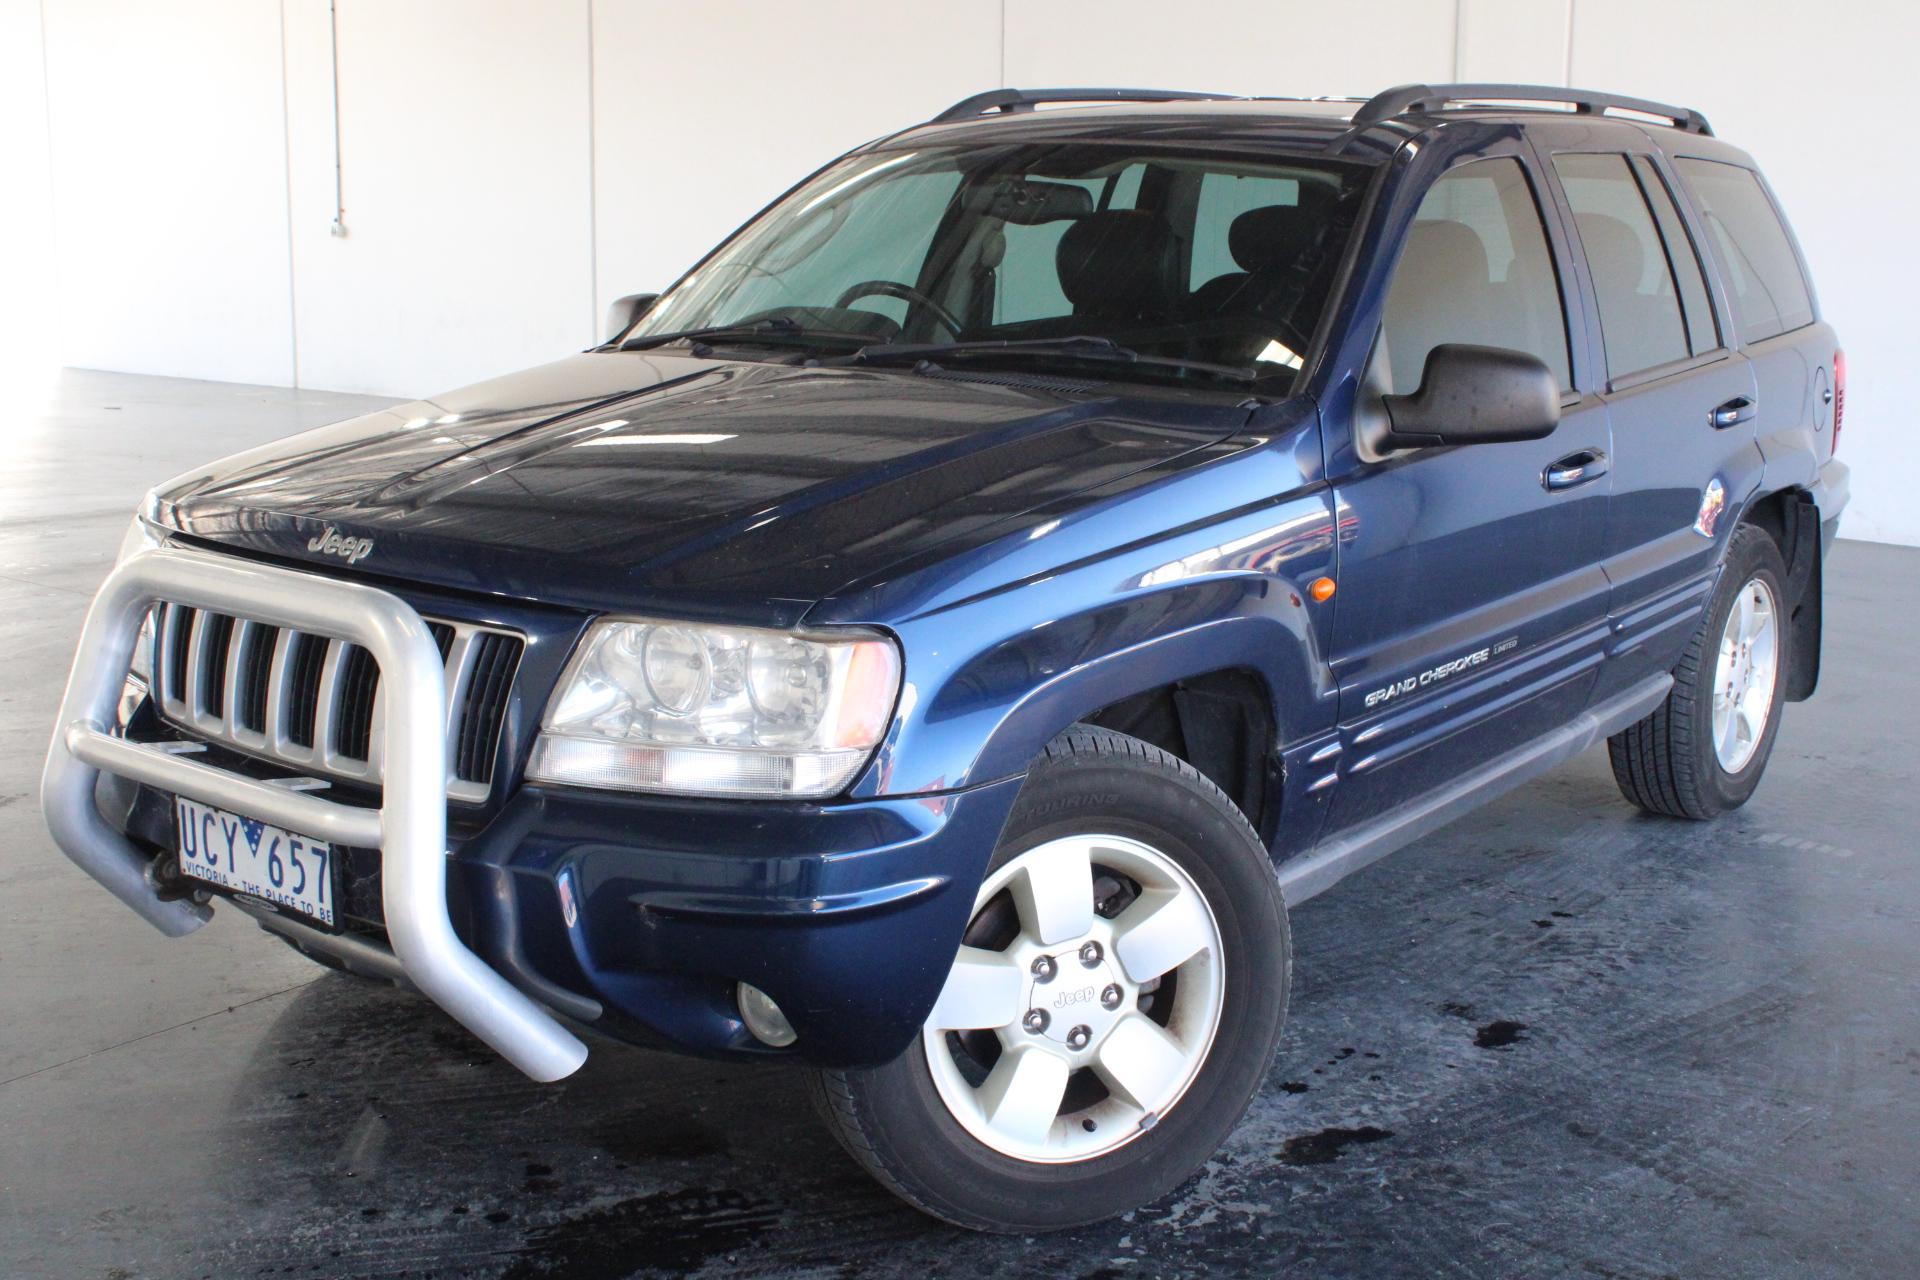 2004 Jeep Grand Cherokee Limited (4x4) WG Automatic Wagon